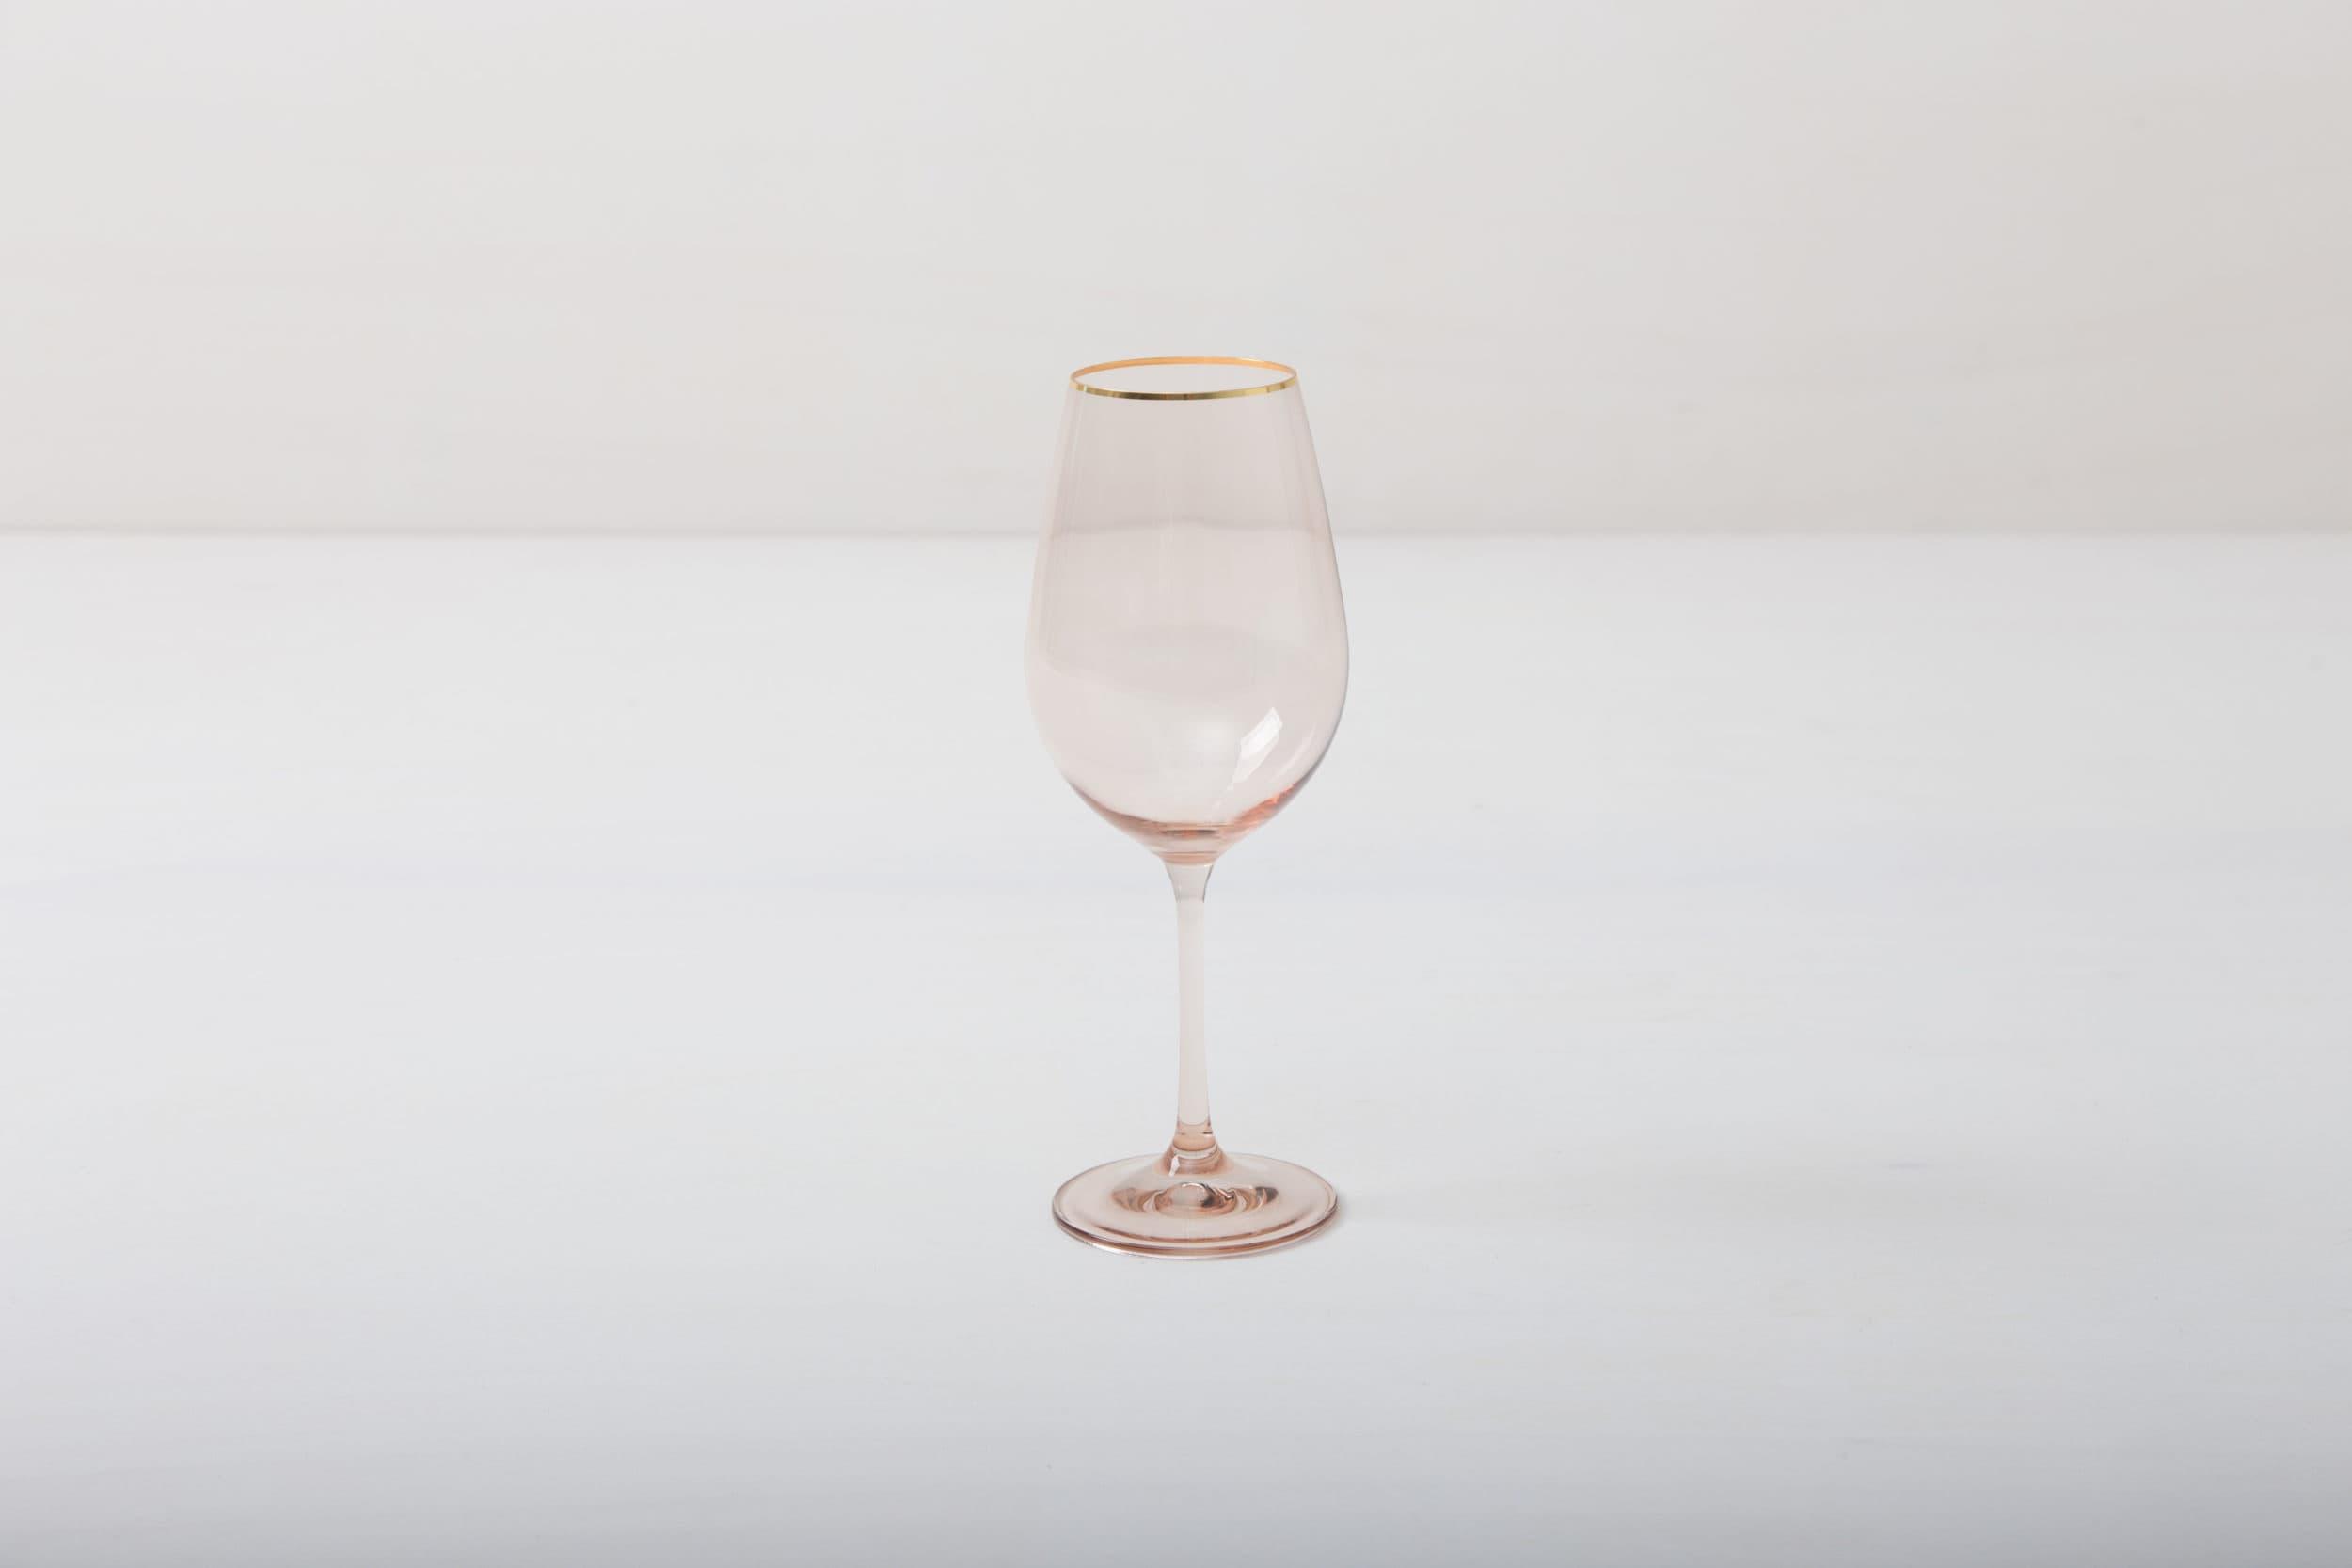 Moderne Weingläser mieten in Berlin, Goldrand,Hamburg, Köln